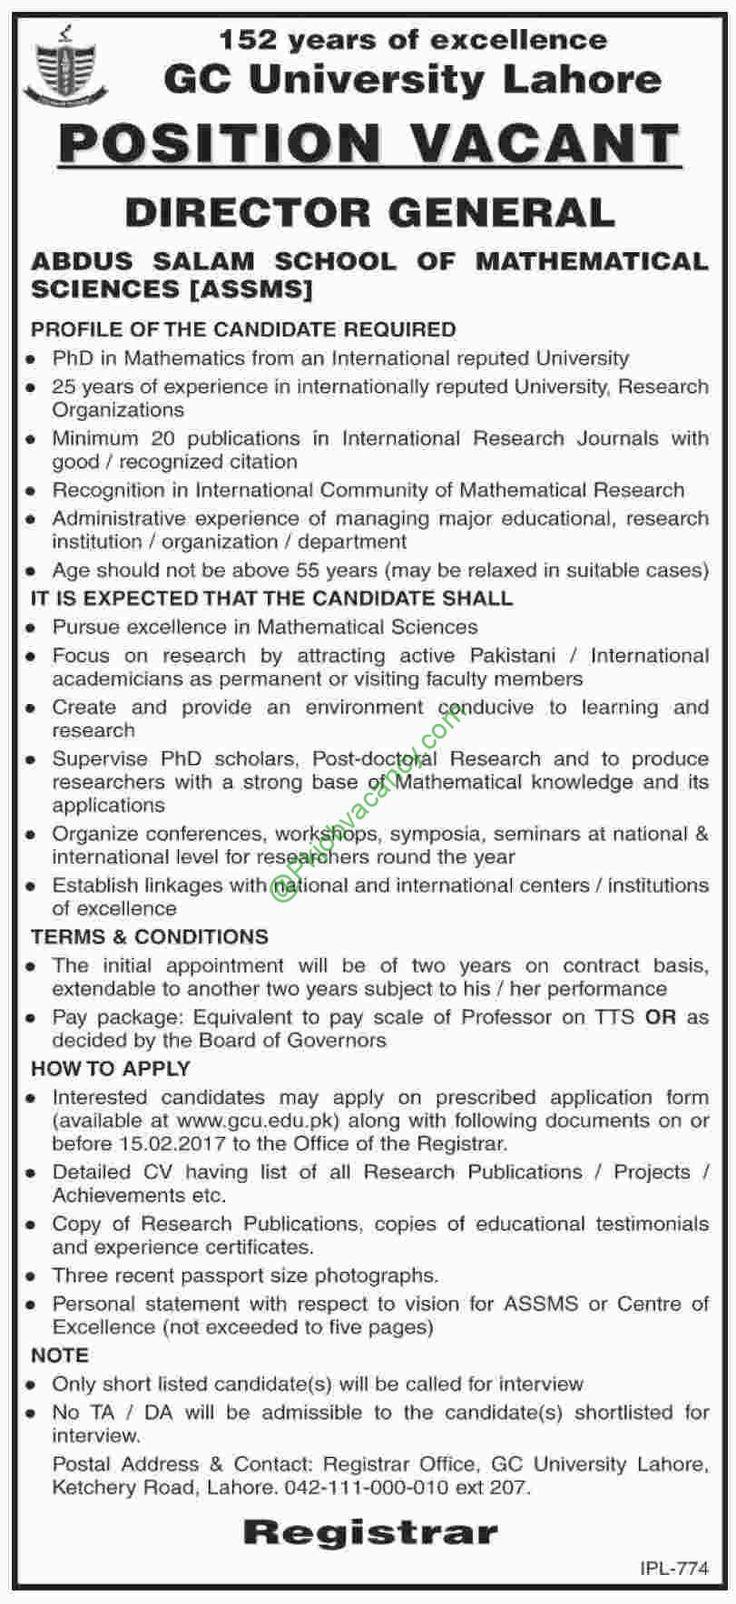 Abdus Salam School Of Mathematical Sciences ASSMS Jobs Dawn Newspaper 2017